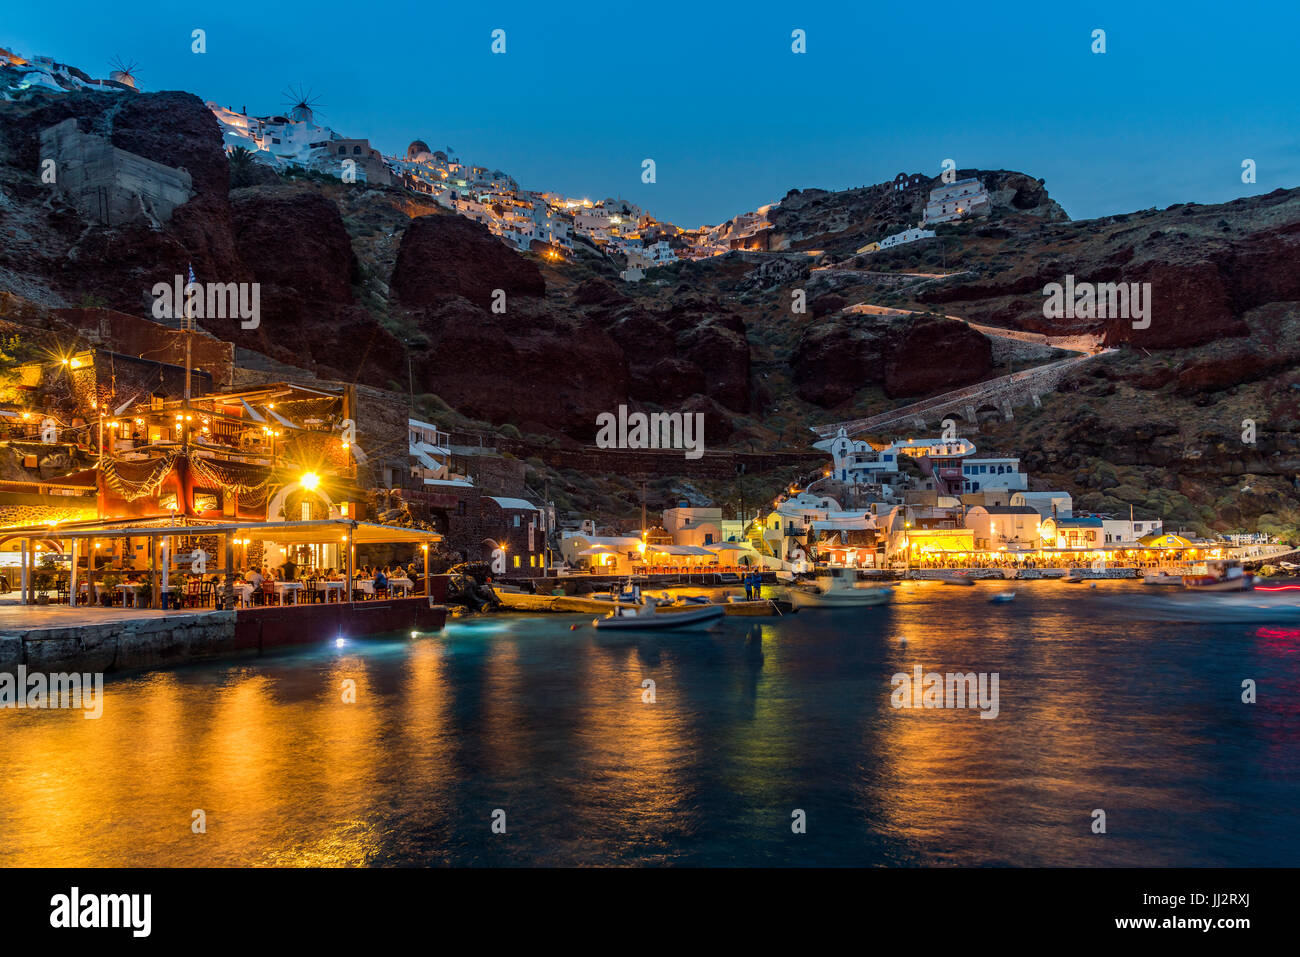 Nachtansicht des al Fresco Restaurant am Hafen Ammoudi, Oia, Santorini, Süd Ägäis, Griechenland Stockbild